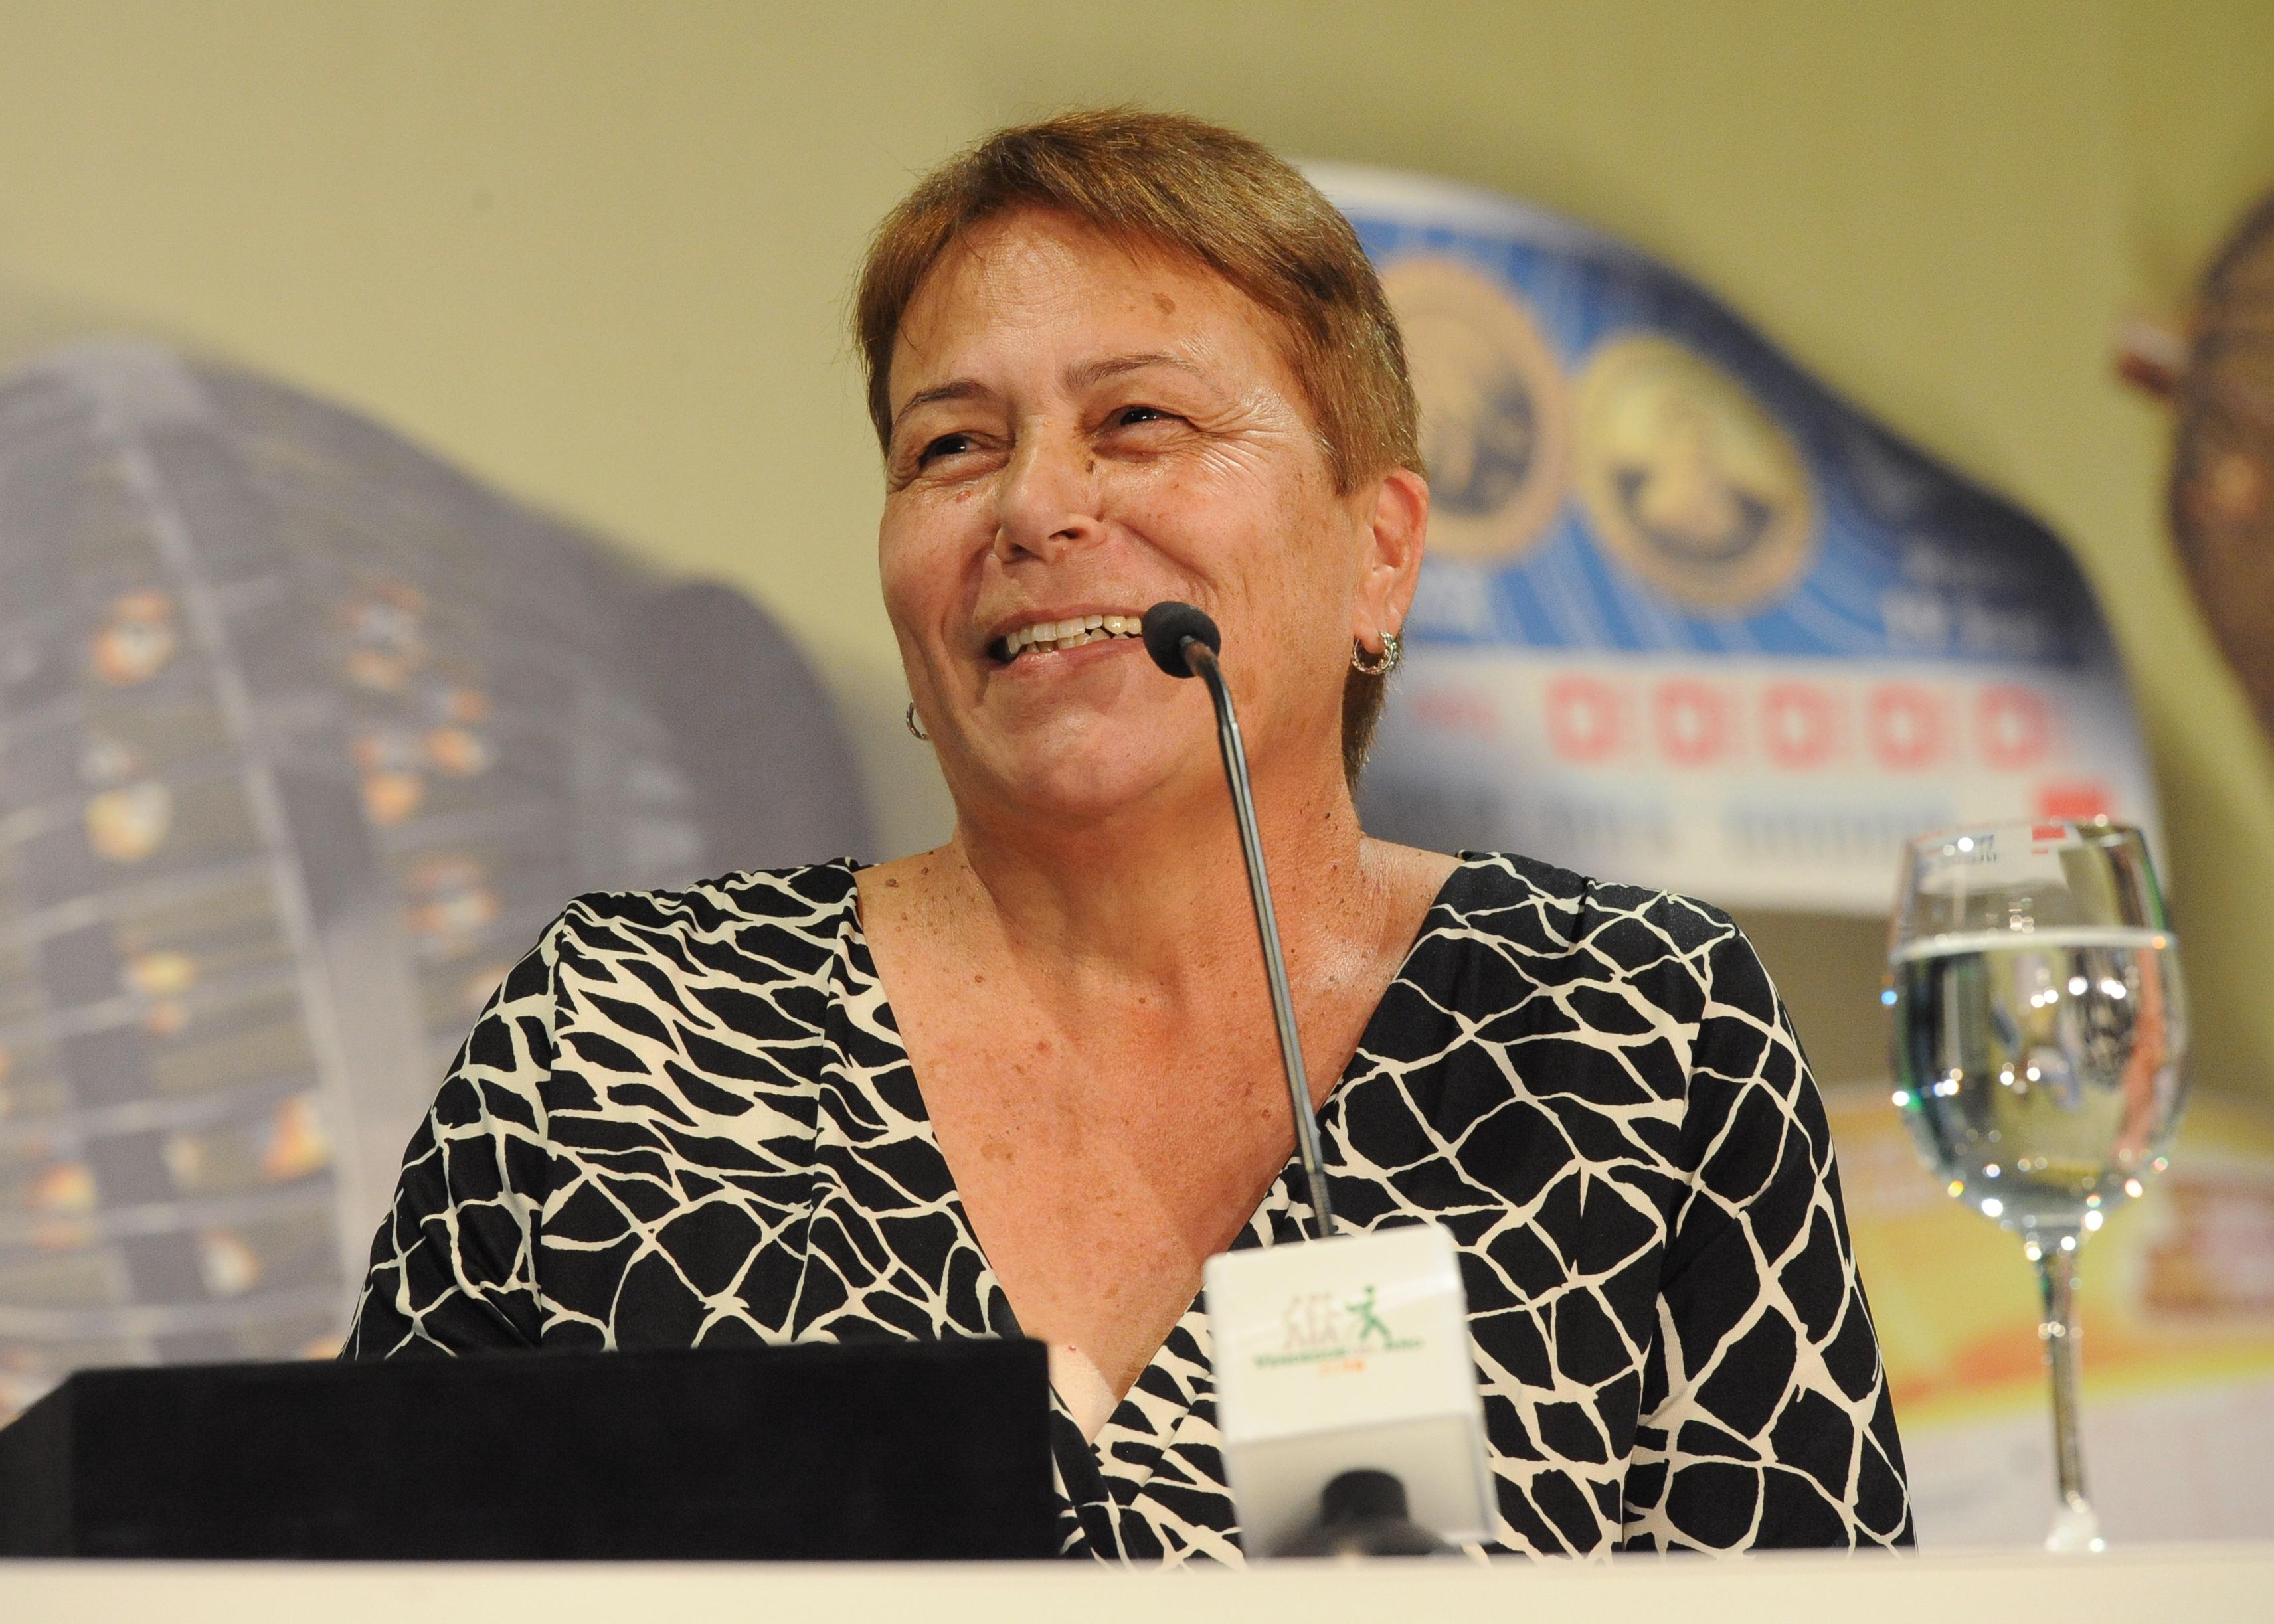 Ángela Mª del Carmen Almeida